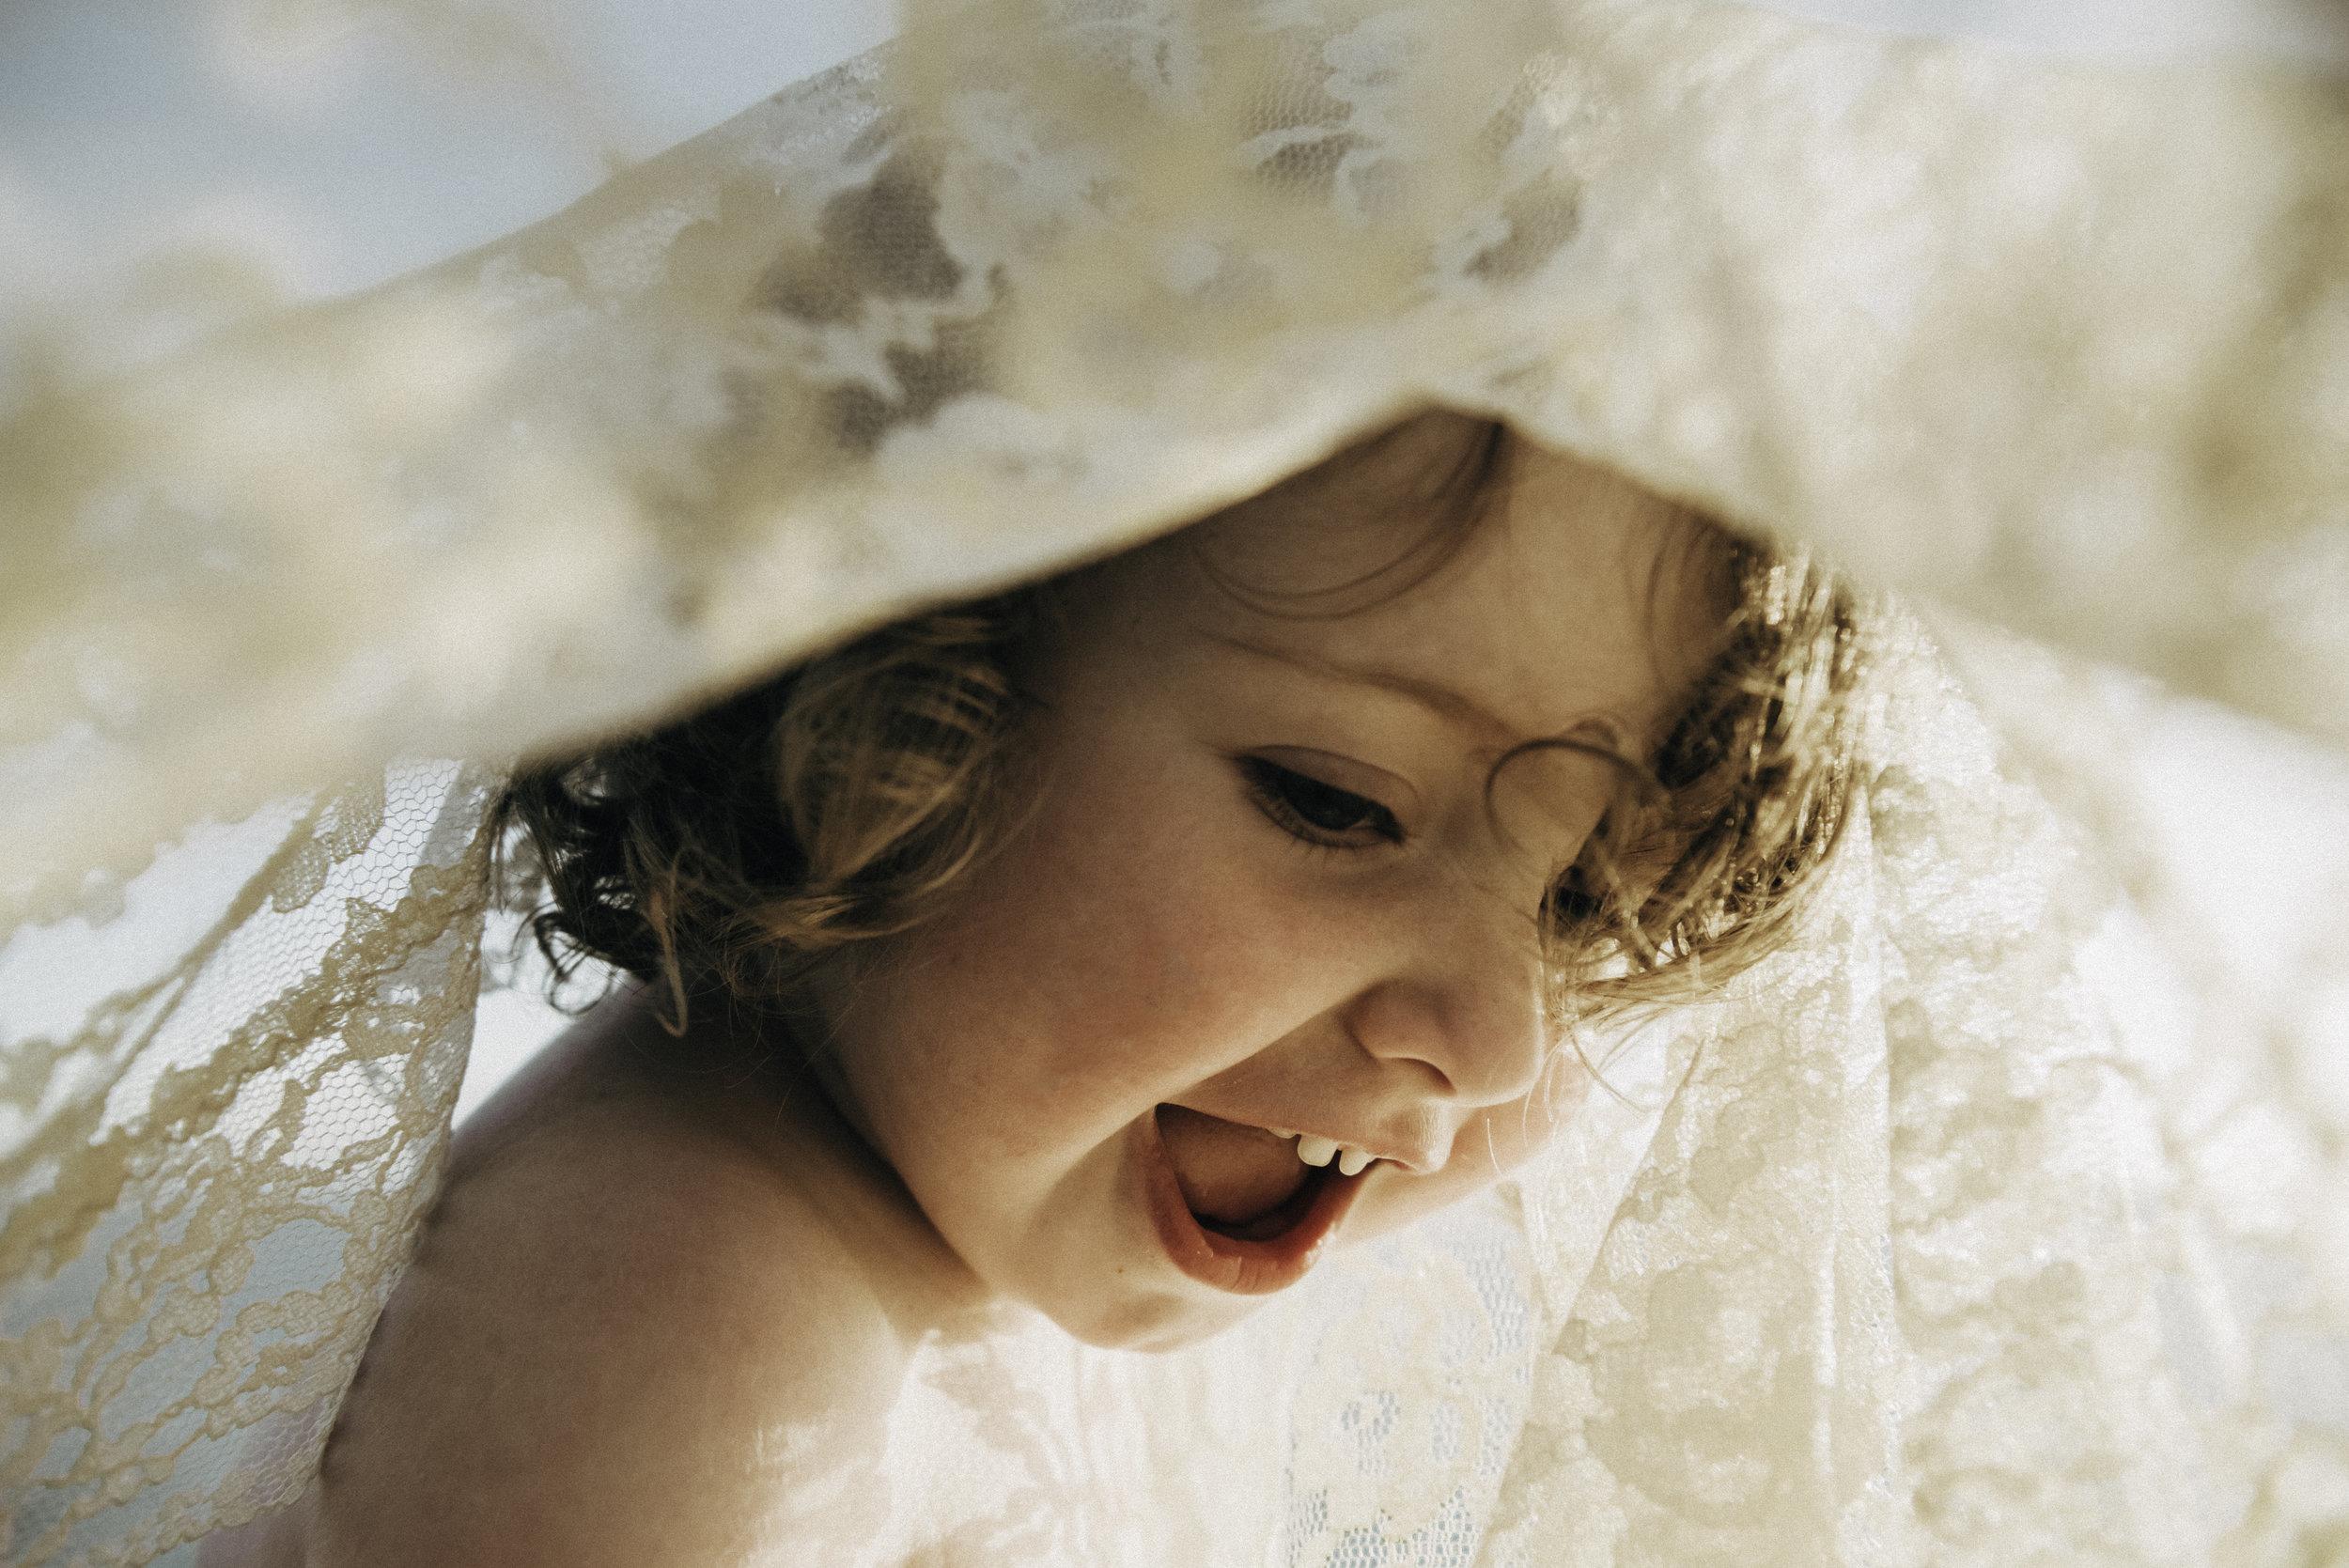 Lets_Spread_Beauty_Photography_Maternity20150620_0033.jpg